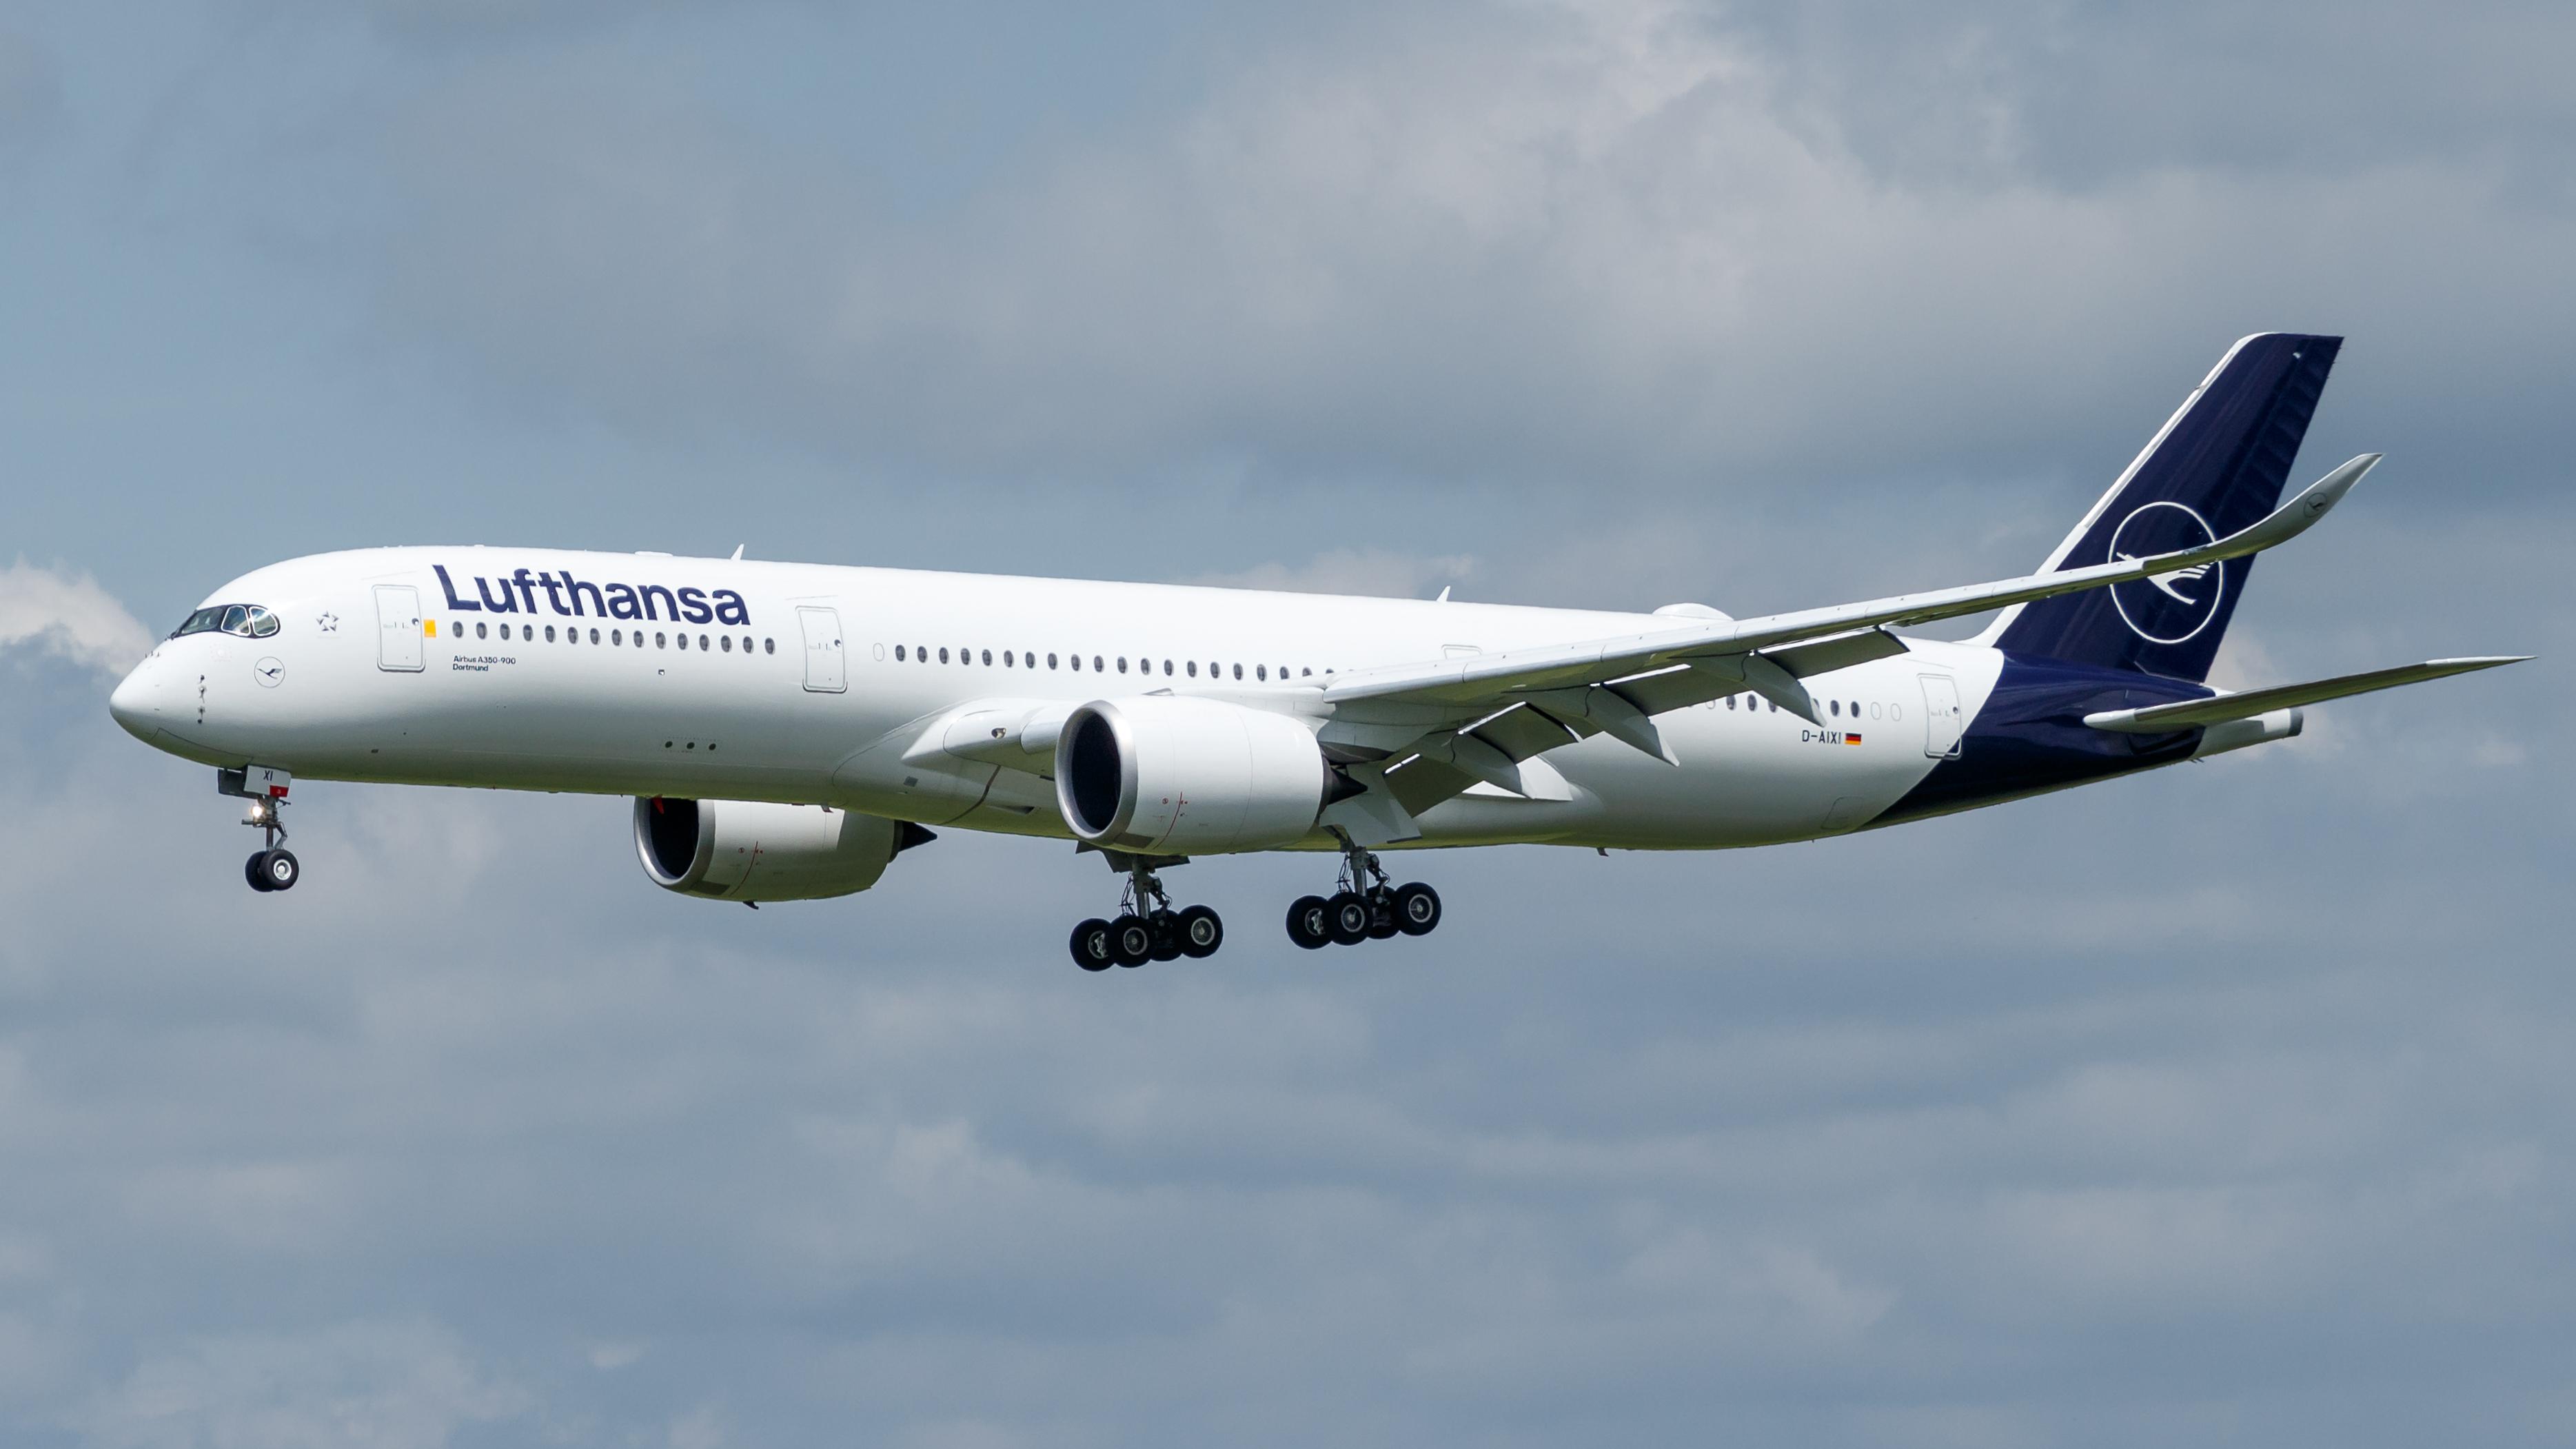 Lufthansa –